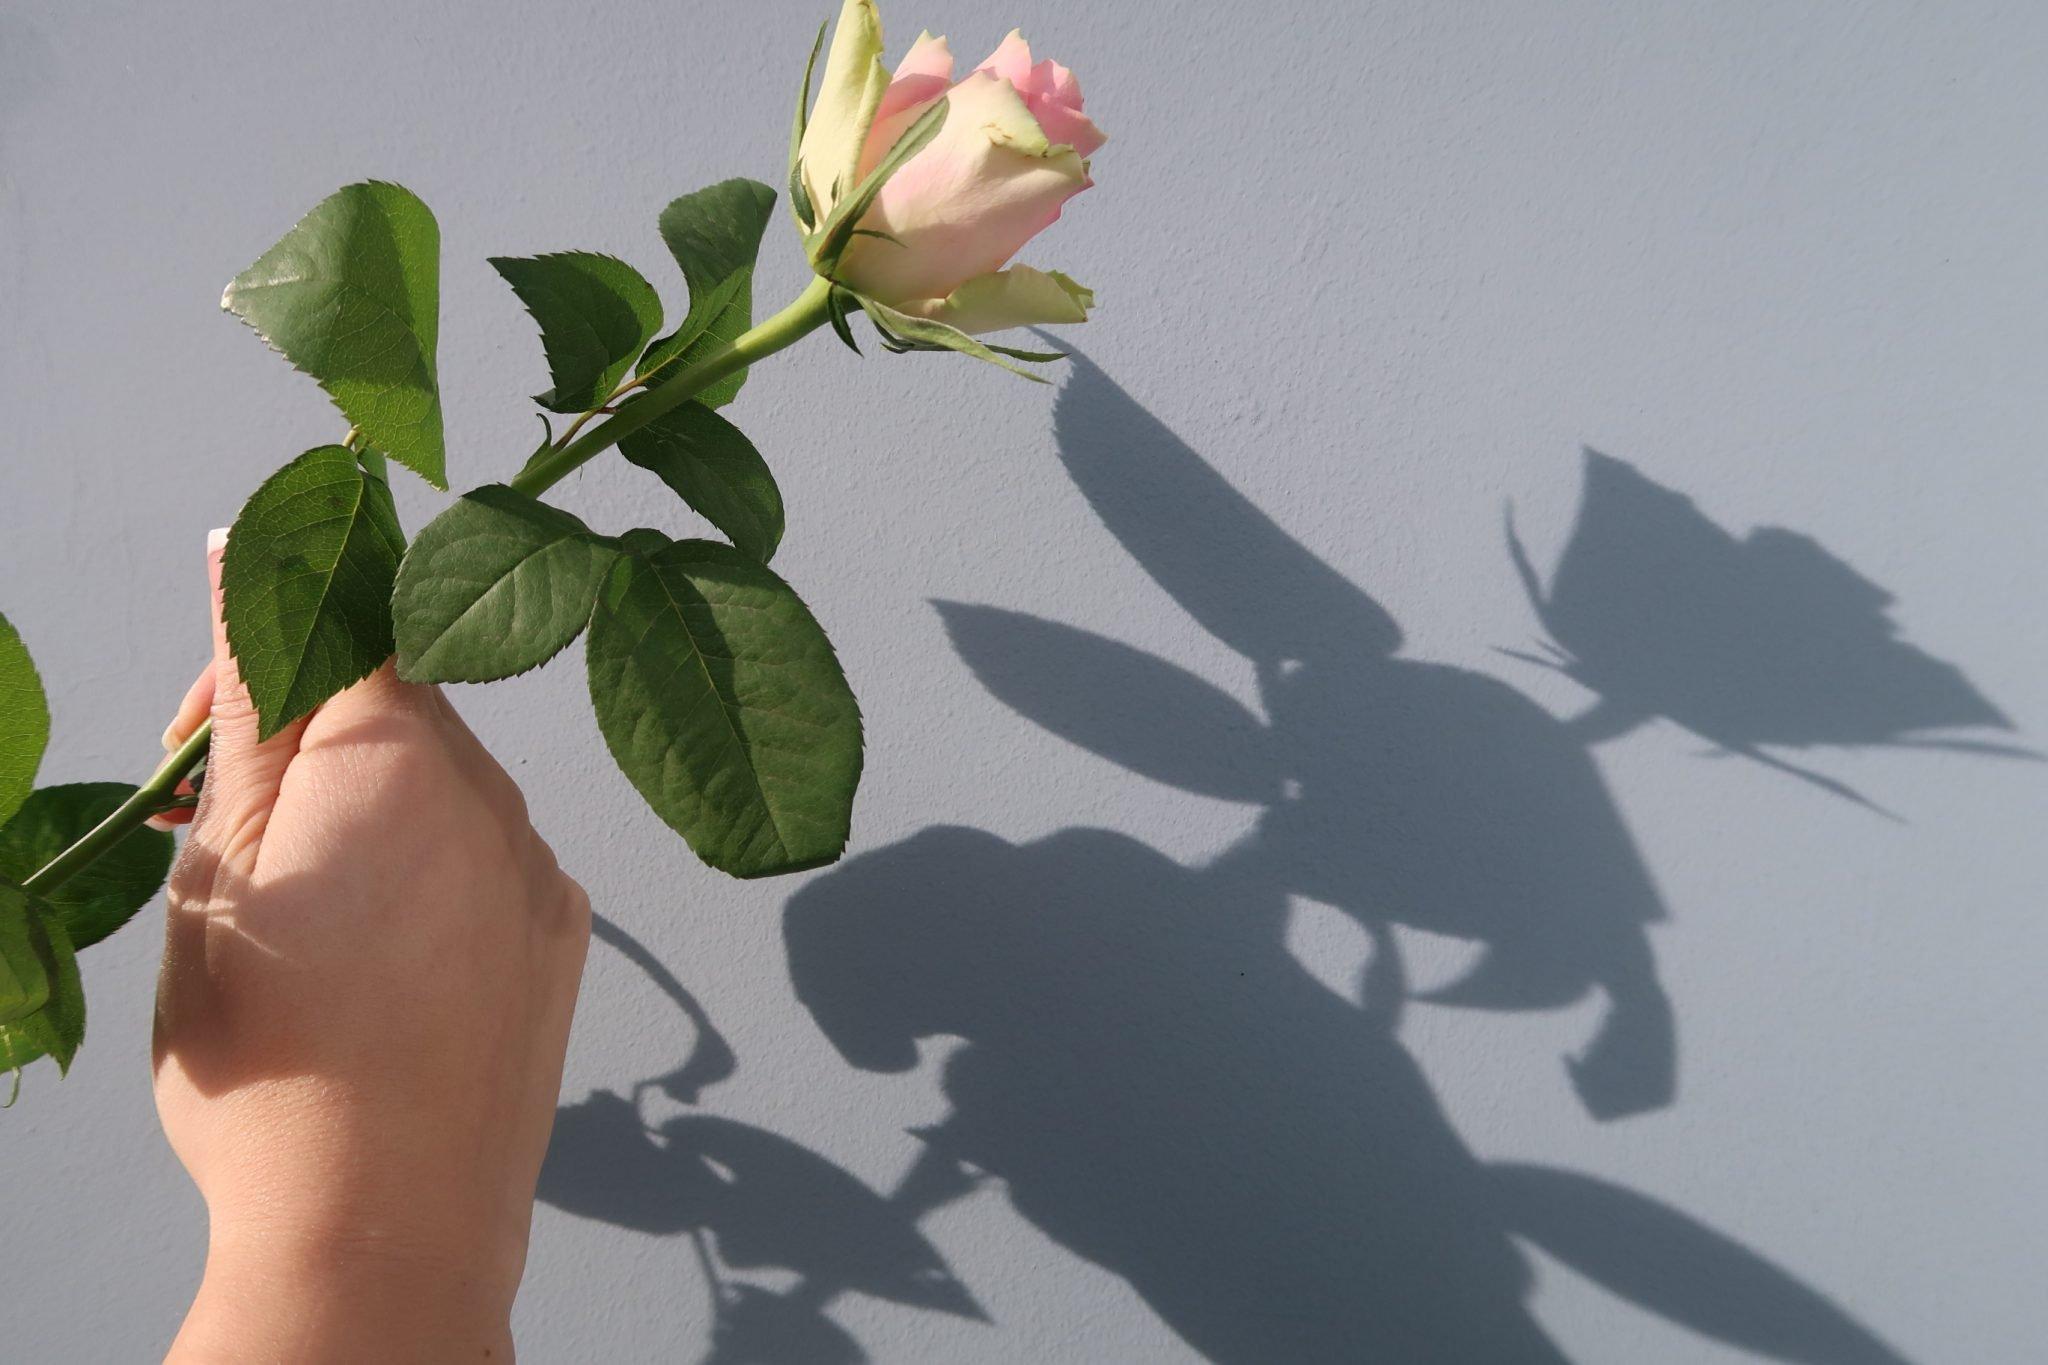 Lahden Seurahuone ruusu